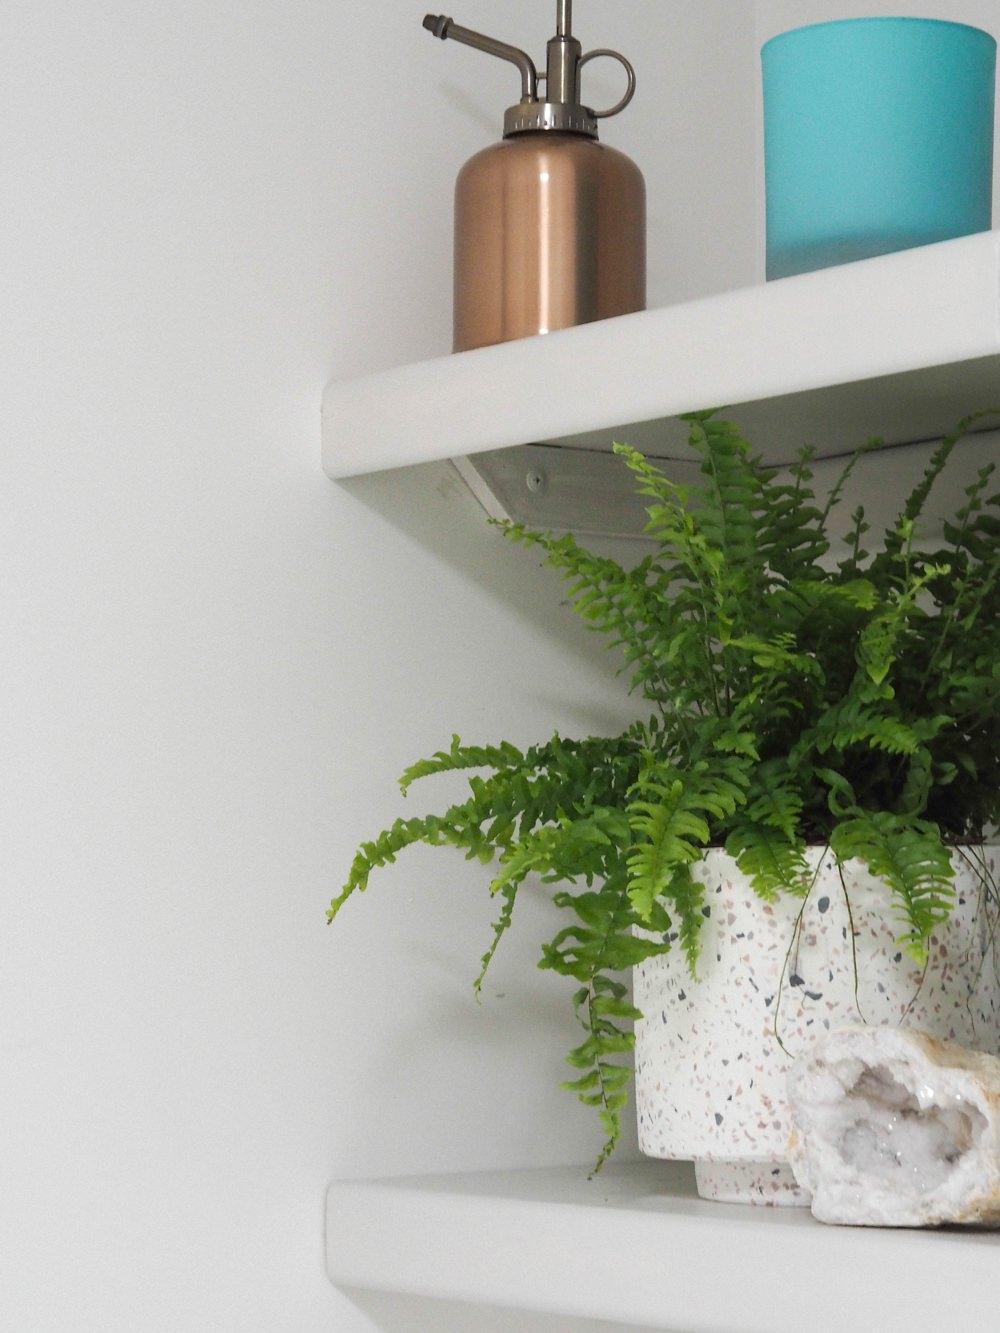 Bathroom Renovation Shelves Shelving Pot Plant Accessories